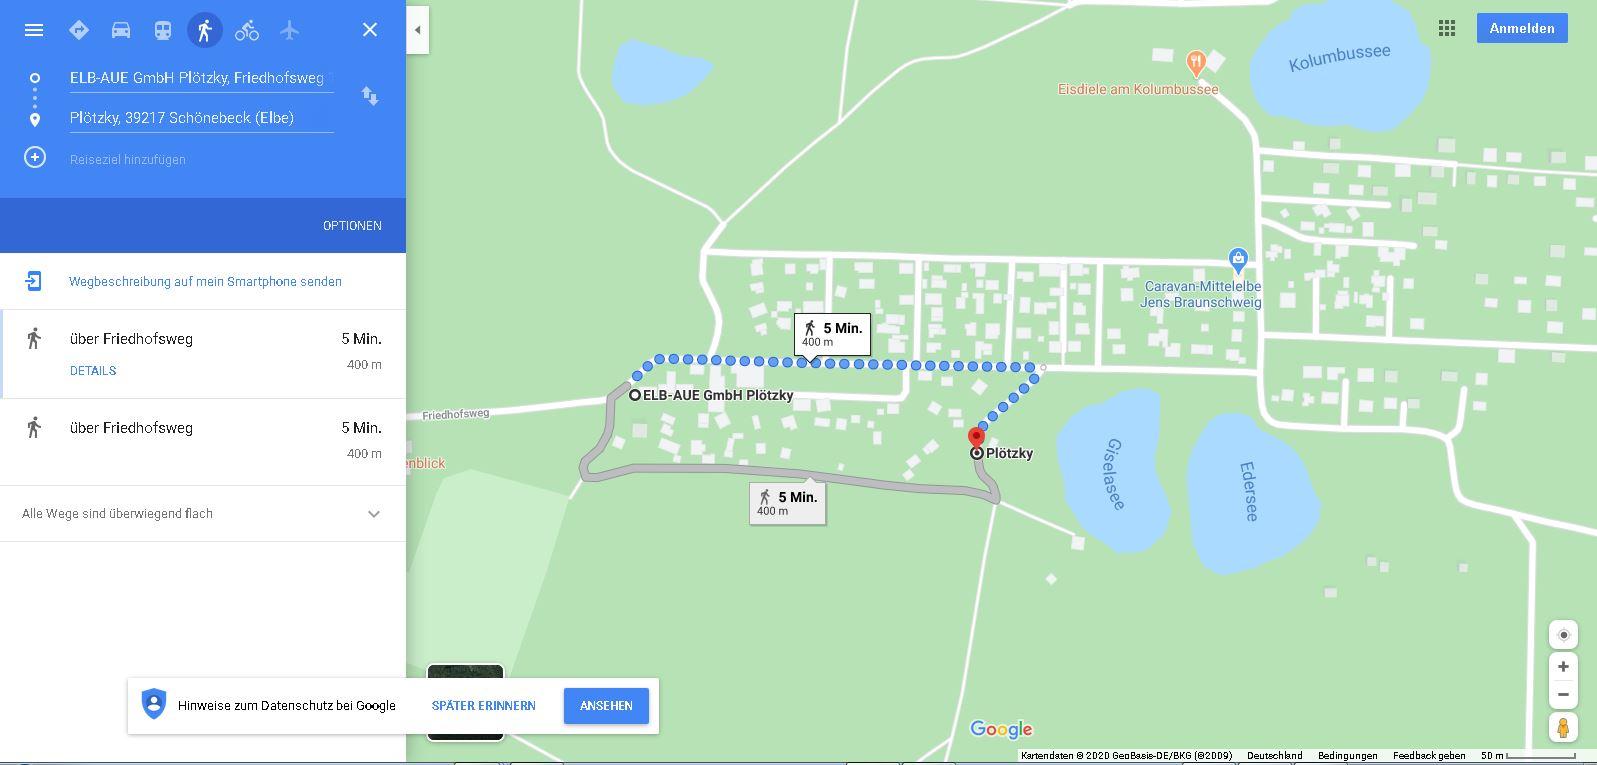 Link Naturparcours falconrider Karte auf Google Maps